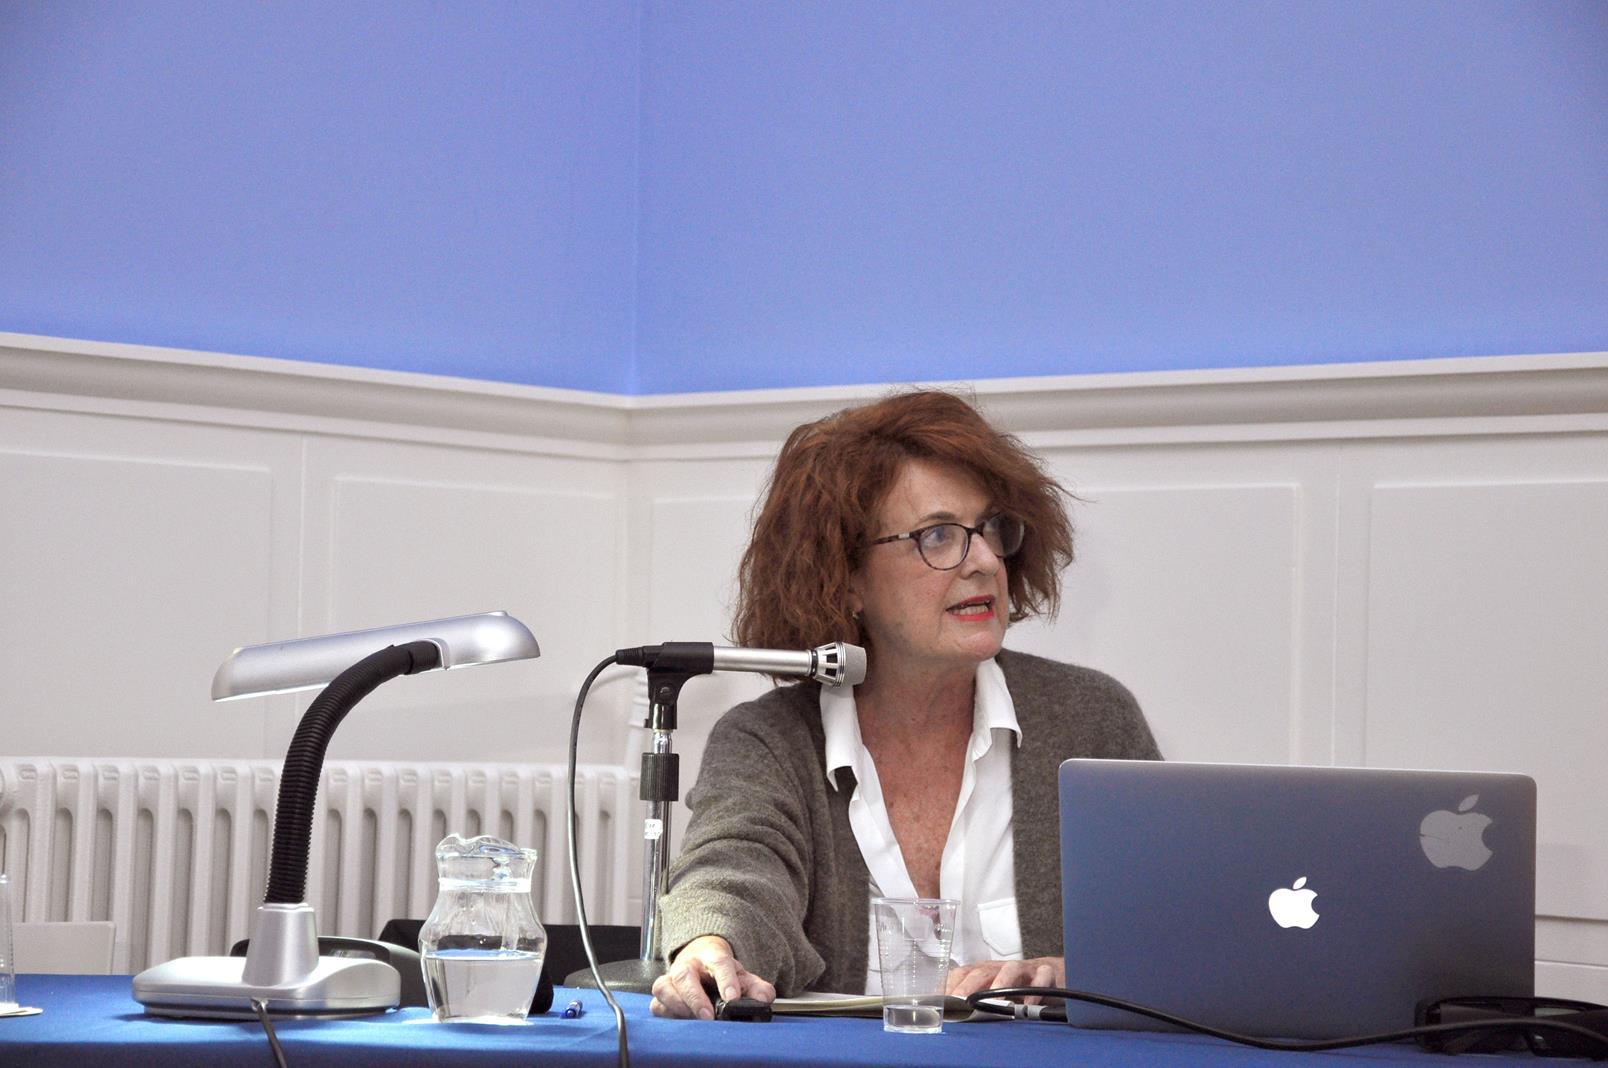 Rachel Bullough, CEU San Pablo, Madrid. 23/10/19.